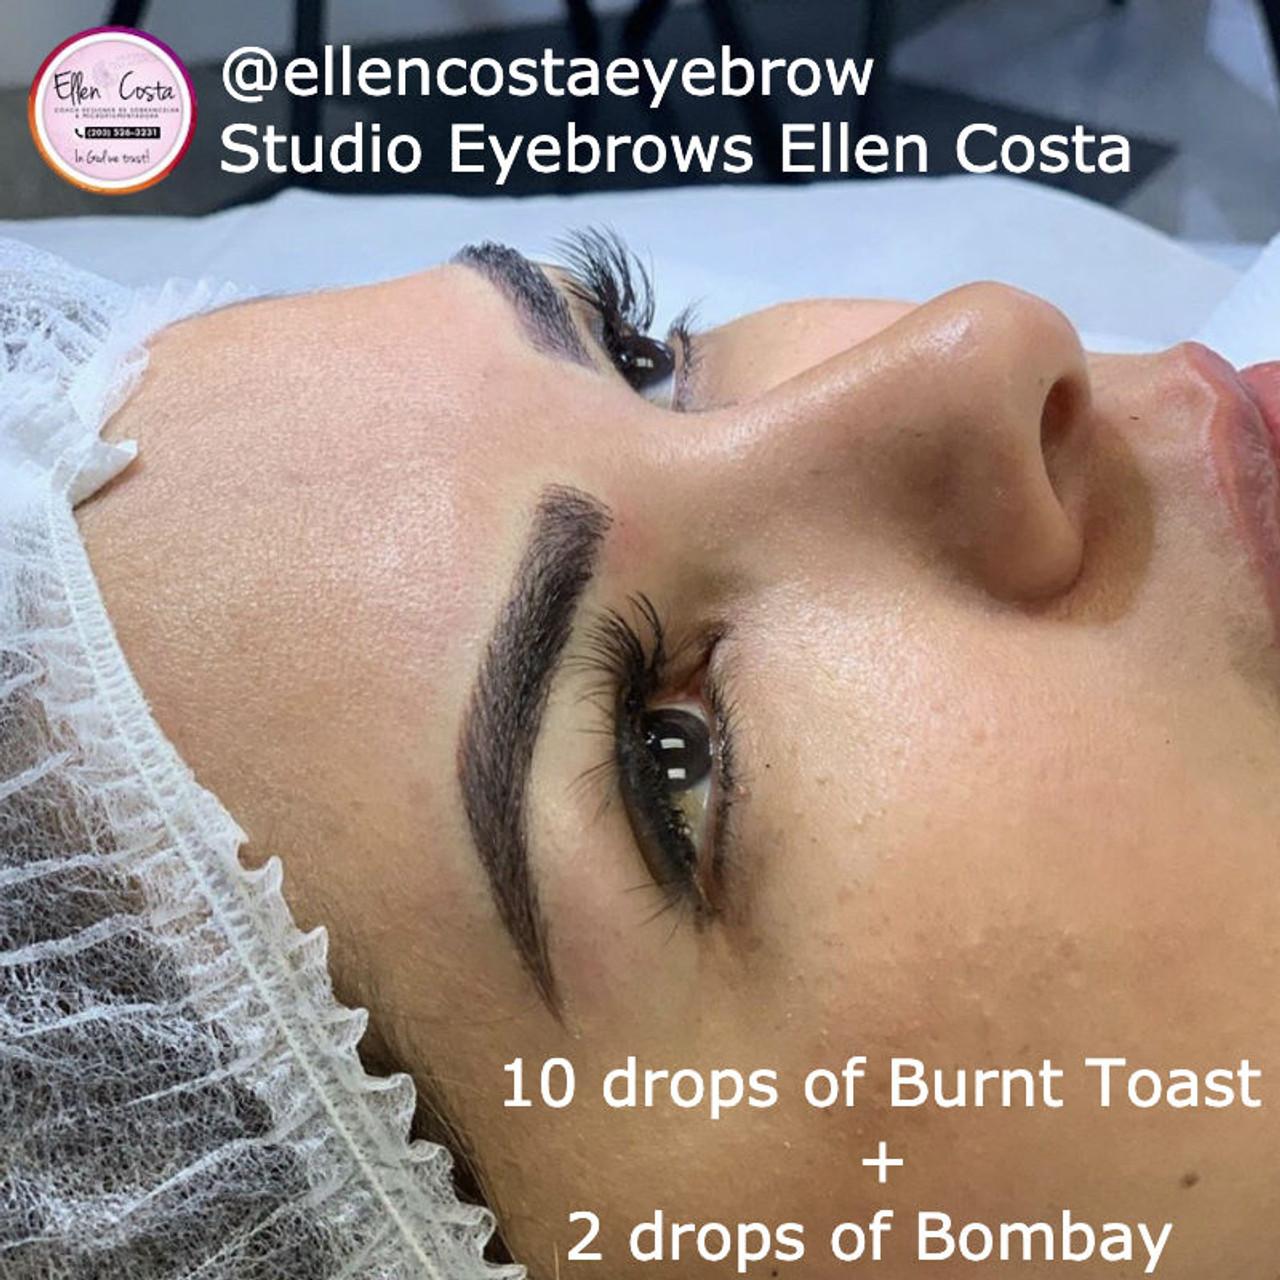 Kolorsource Permanent Makeup Pigment (PMU) Bombay Brown #864 - 15ml